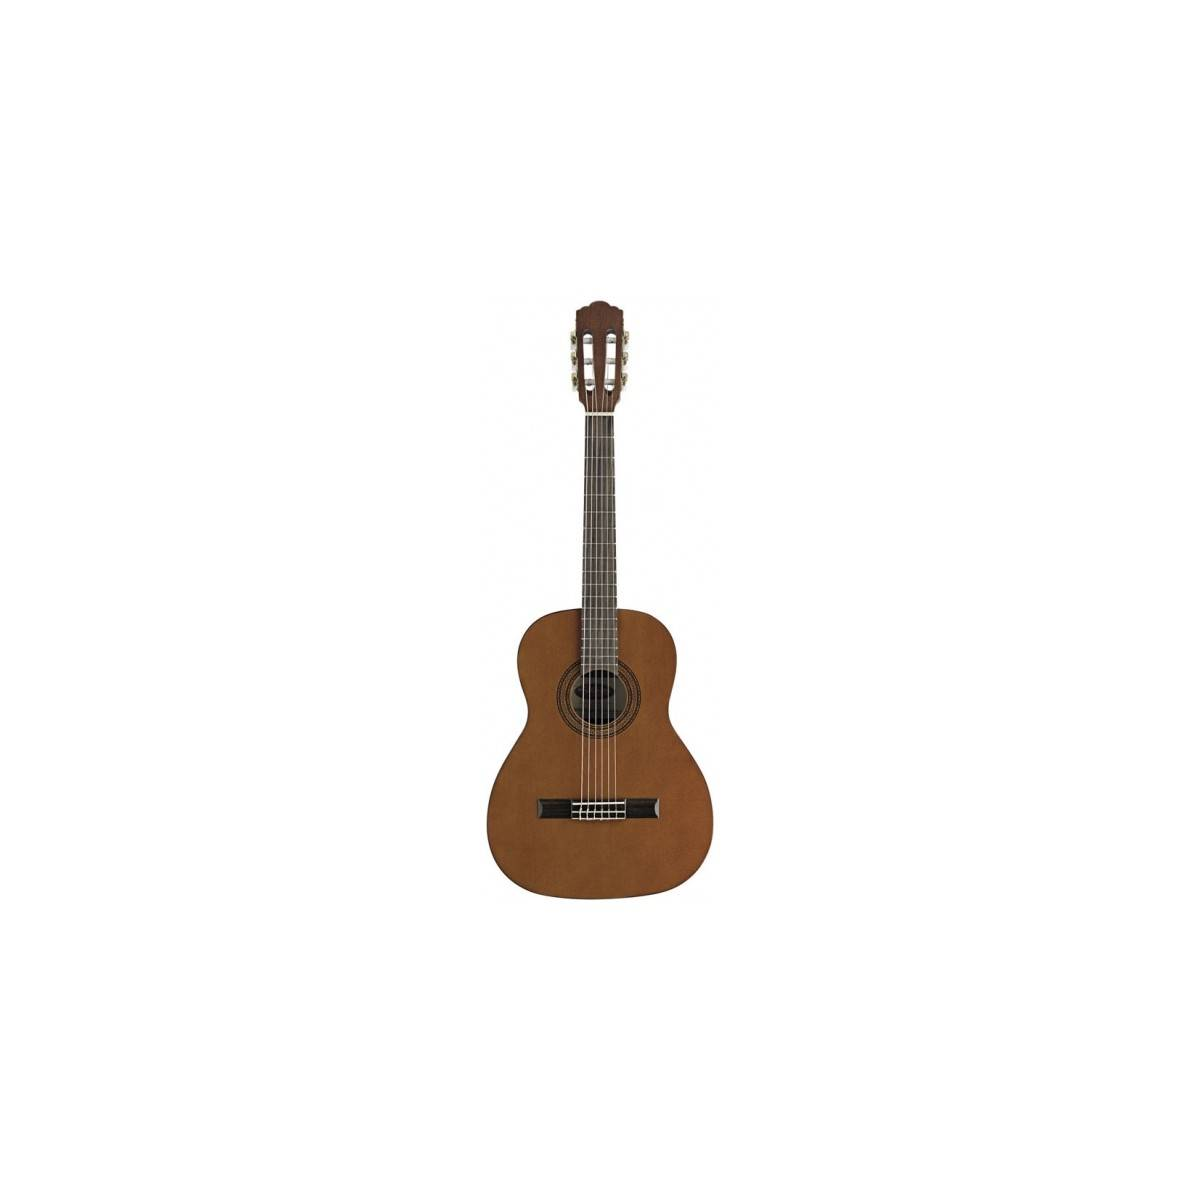 Guitare classique 3/4 Epicéa/Acajou